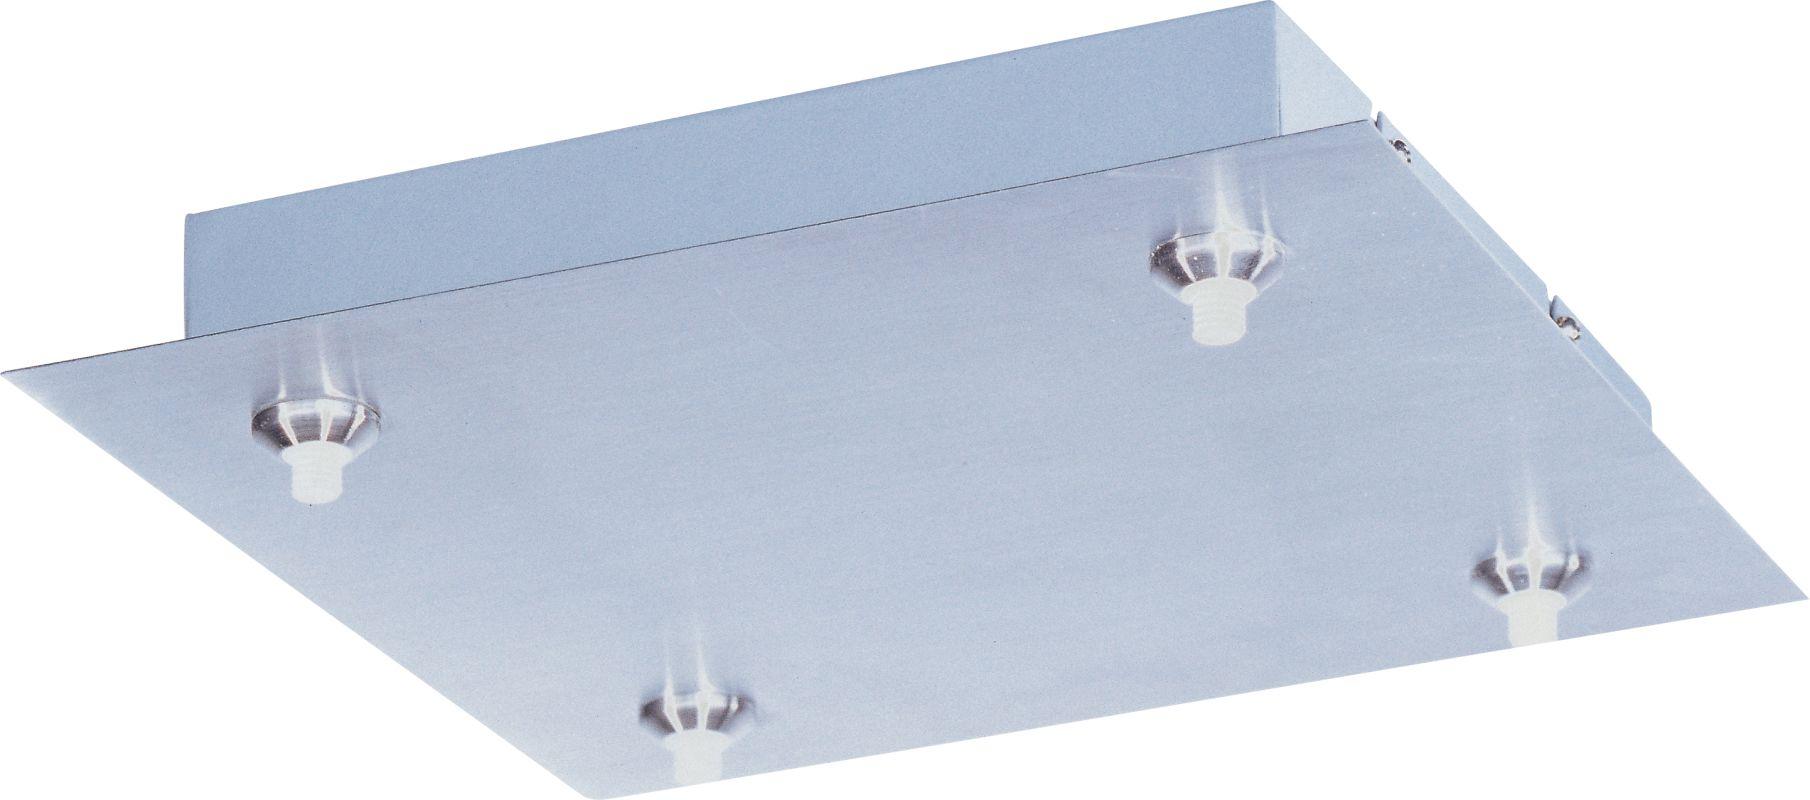 ET2 EC95004 RapidJack 4 Light Canopy Satin Nickel Accessory Canopies